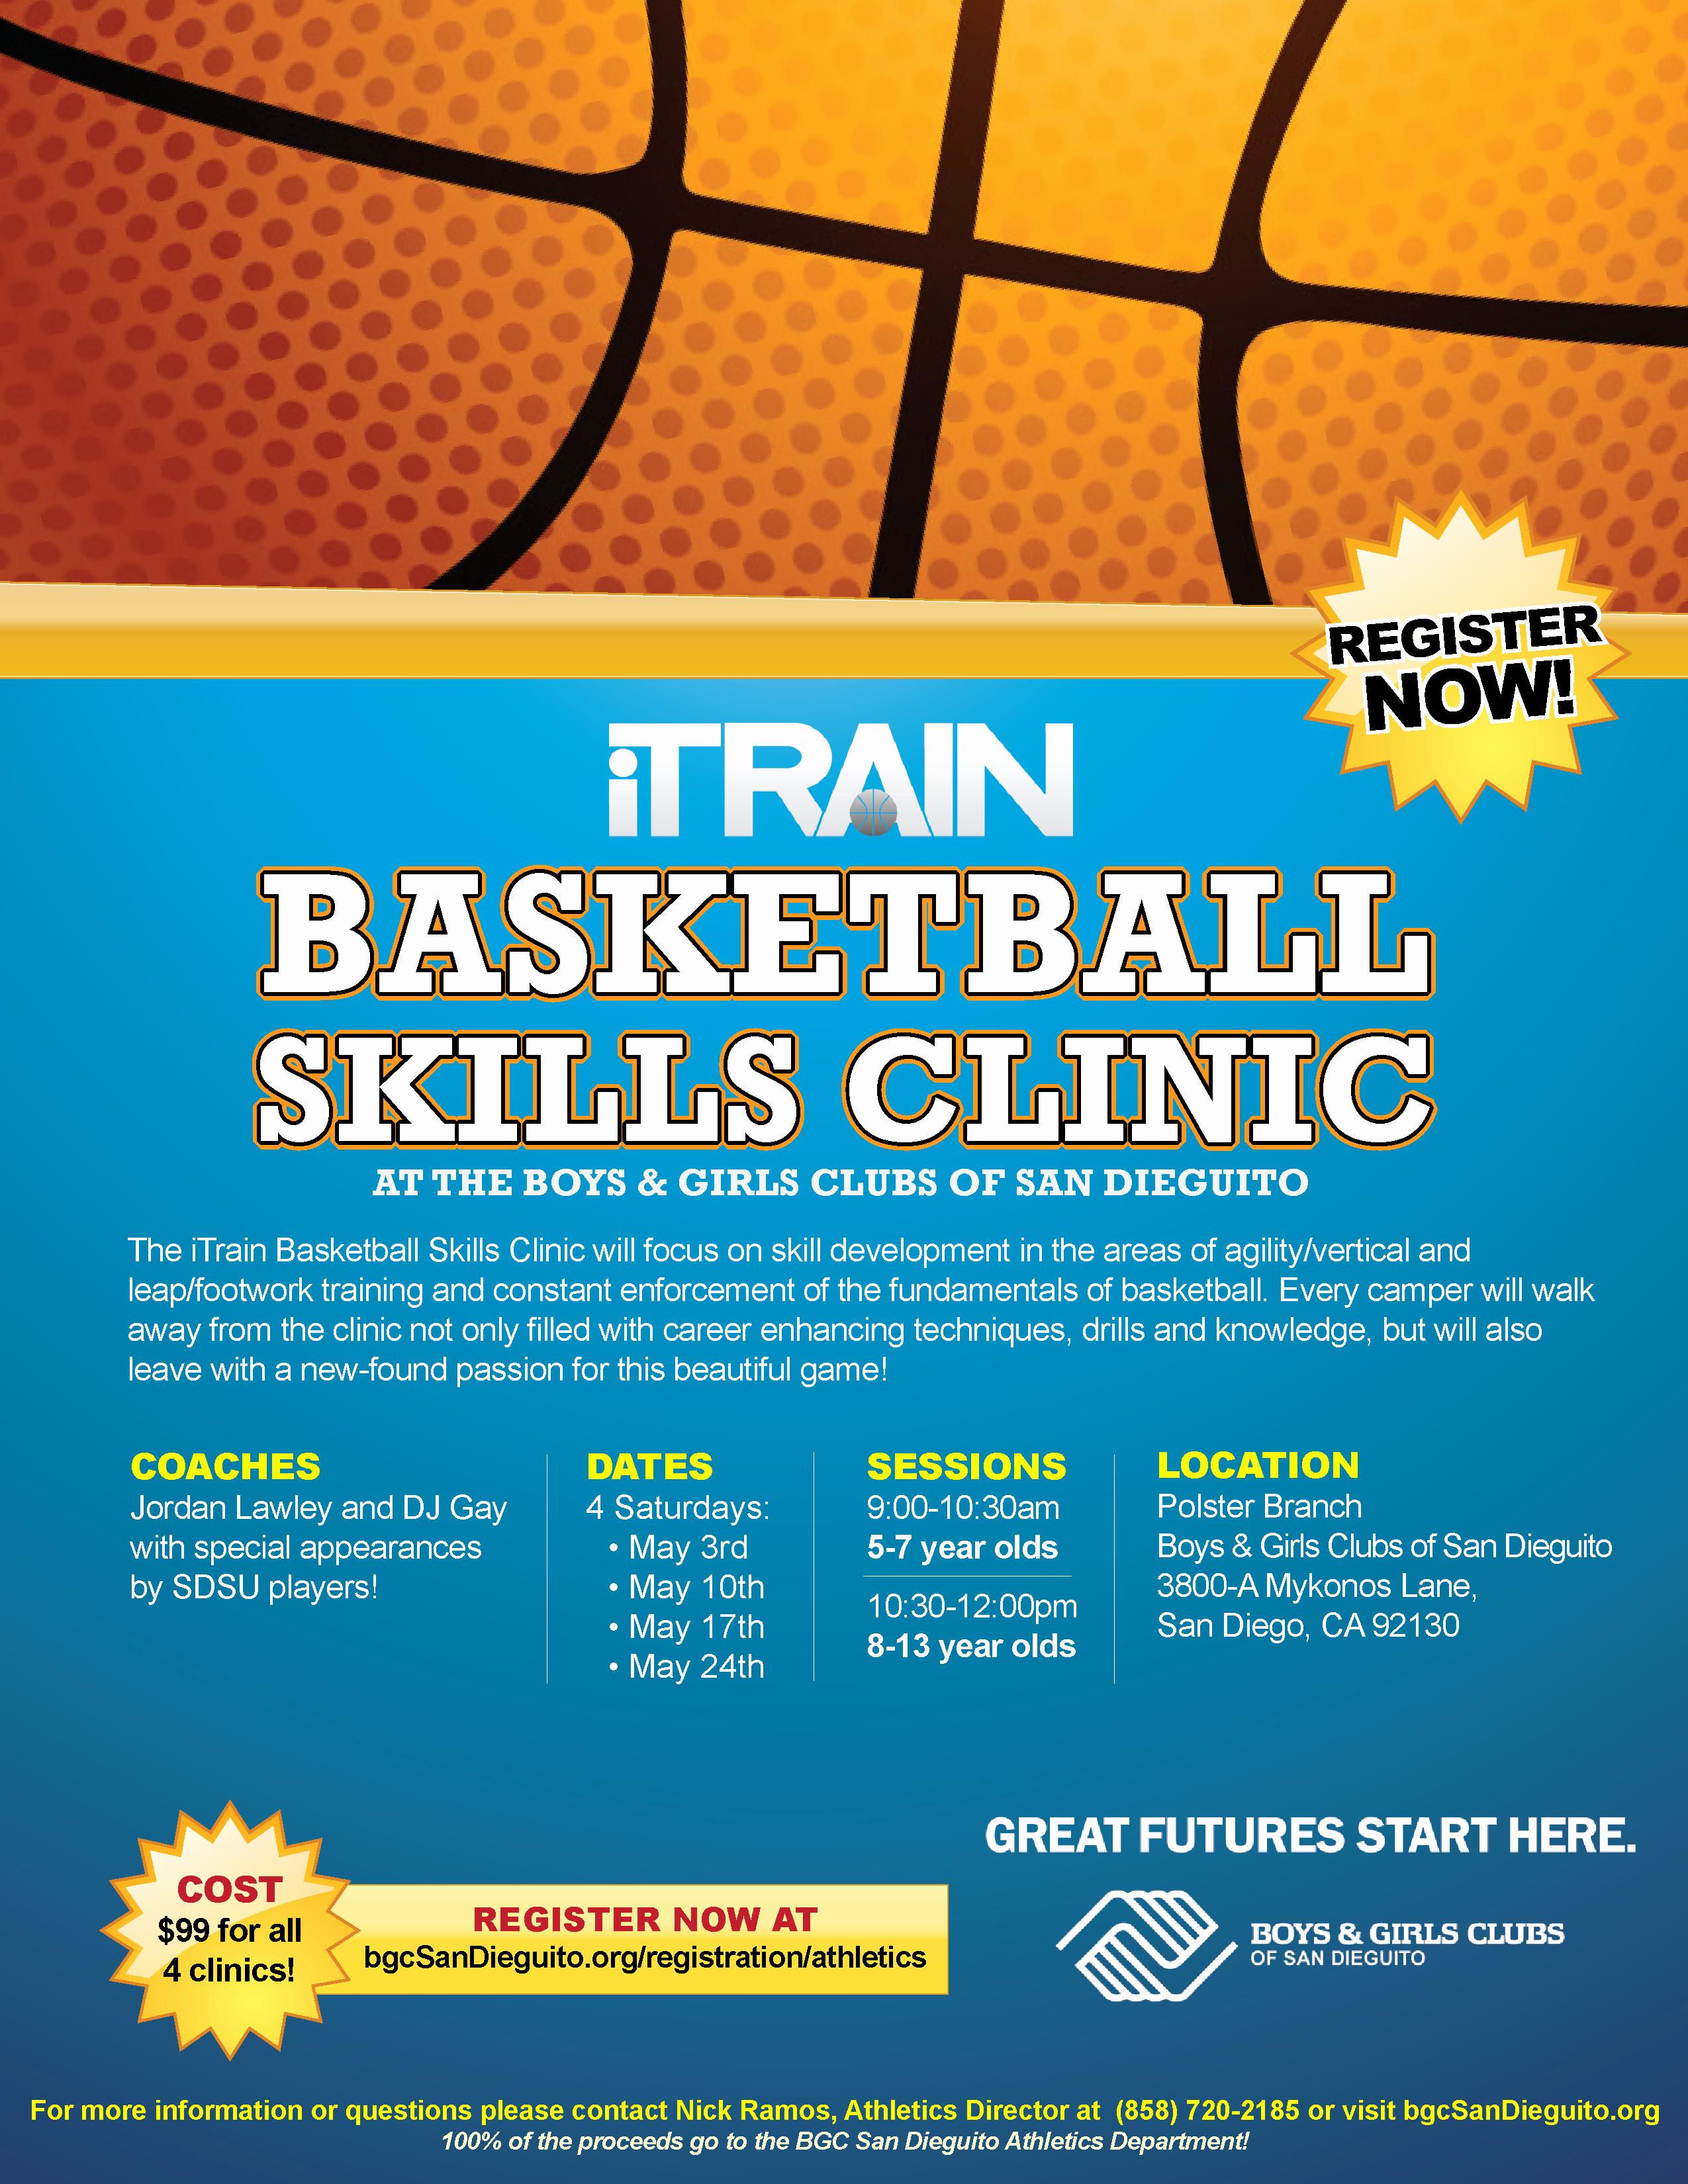 Basketball Camp Flyer Template Inspirational Basketball Camp Flyer Tim Williams Basketball Camp